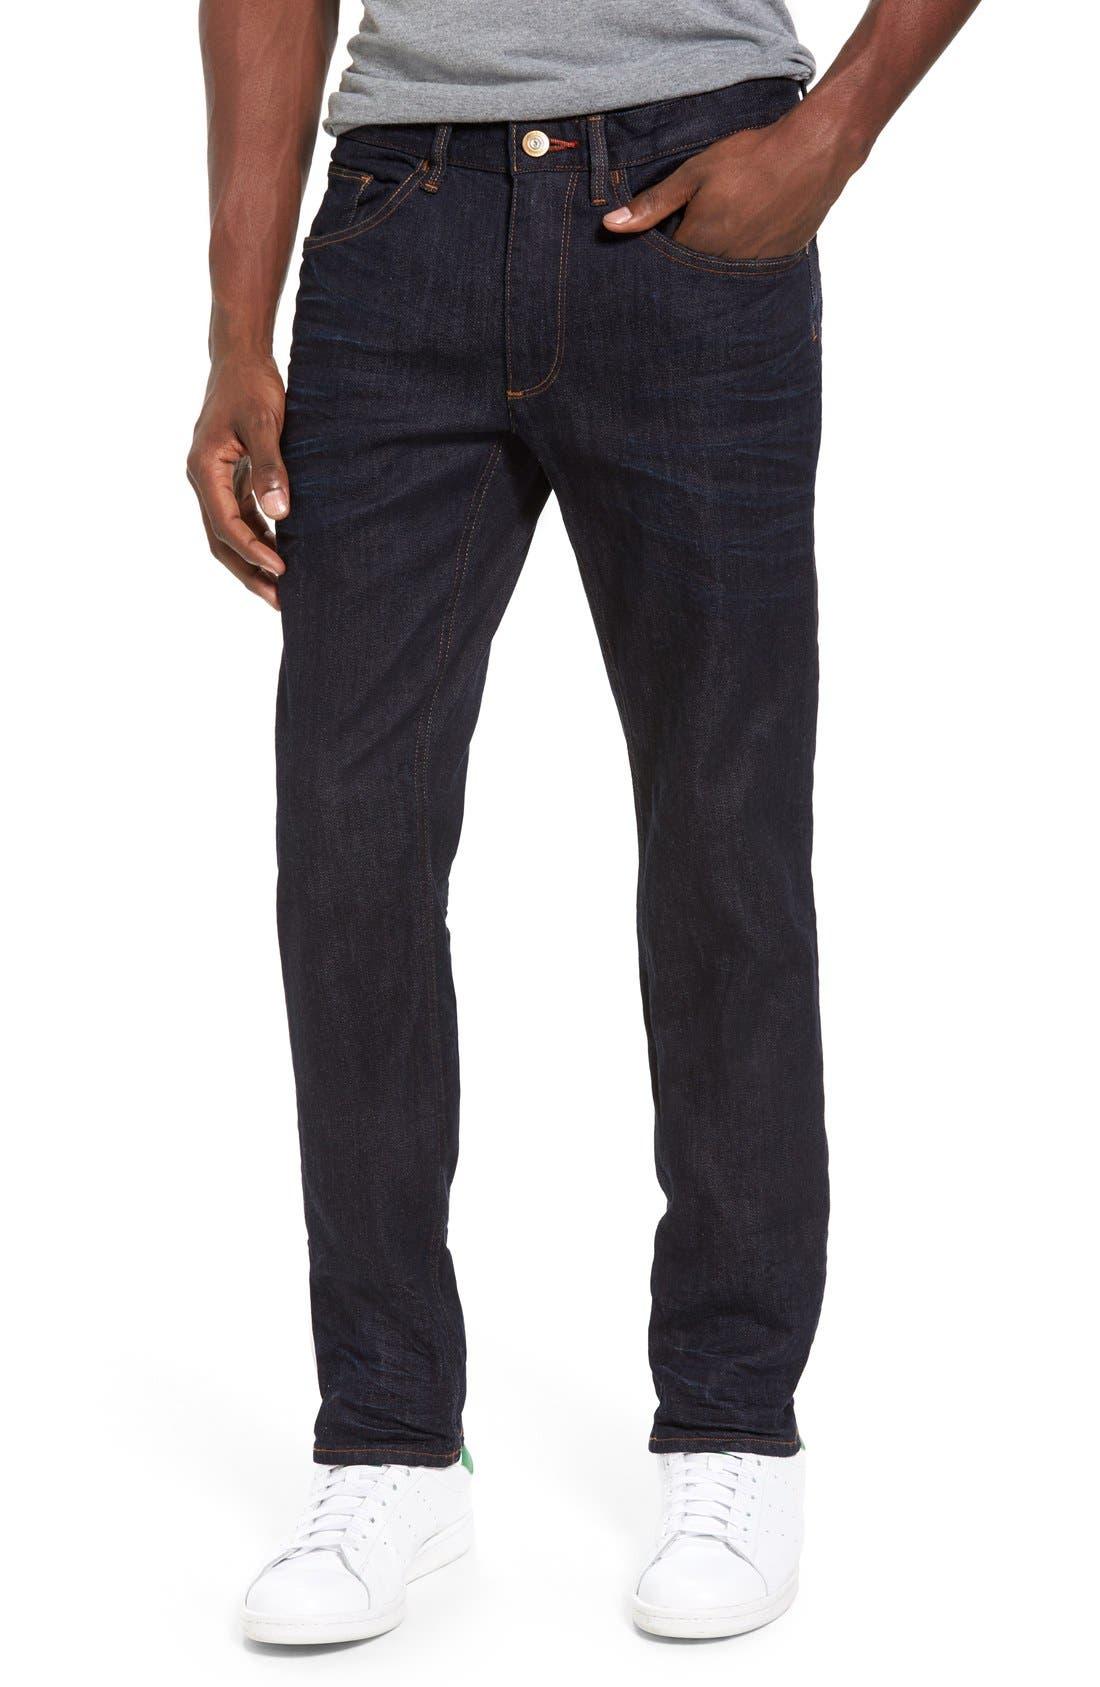 Canal Slim Fit Jeans,                             Main thumbnail 1, color,